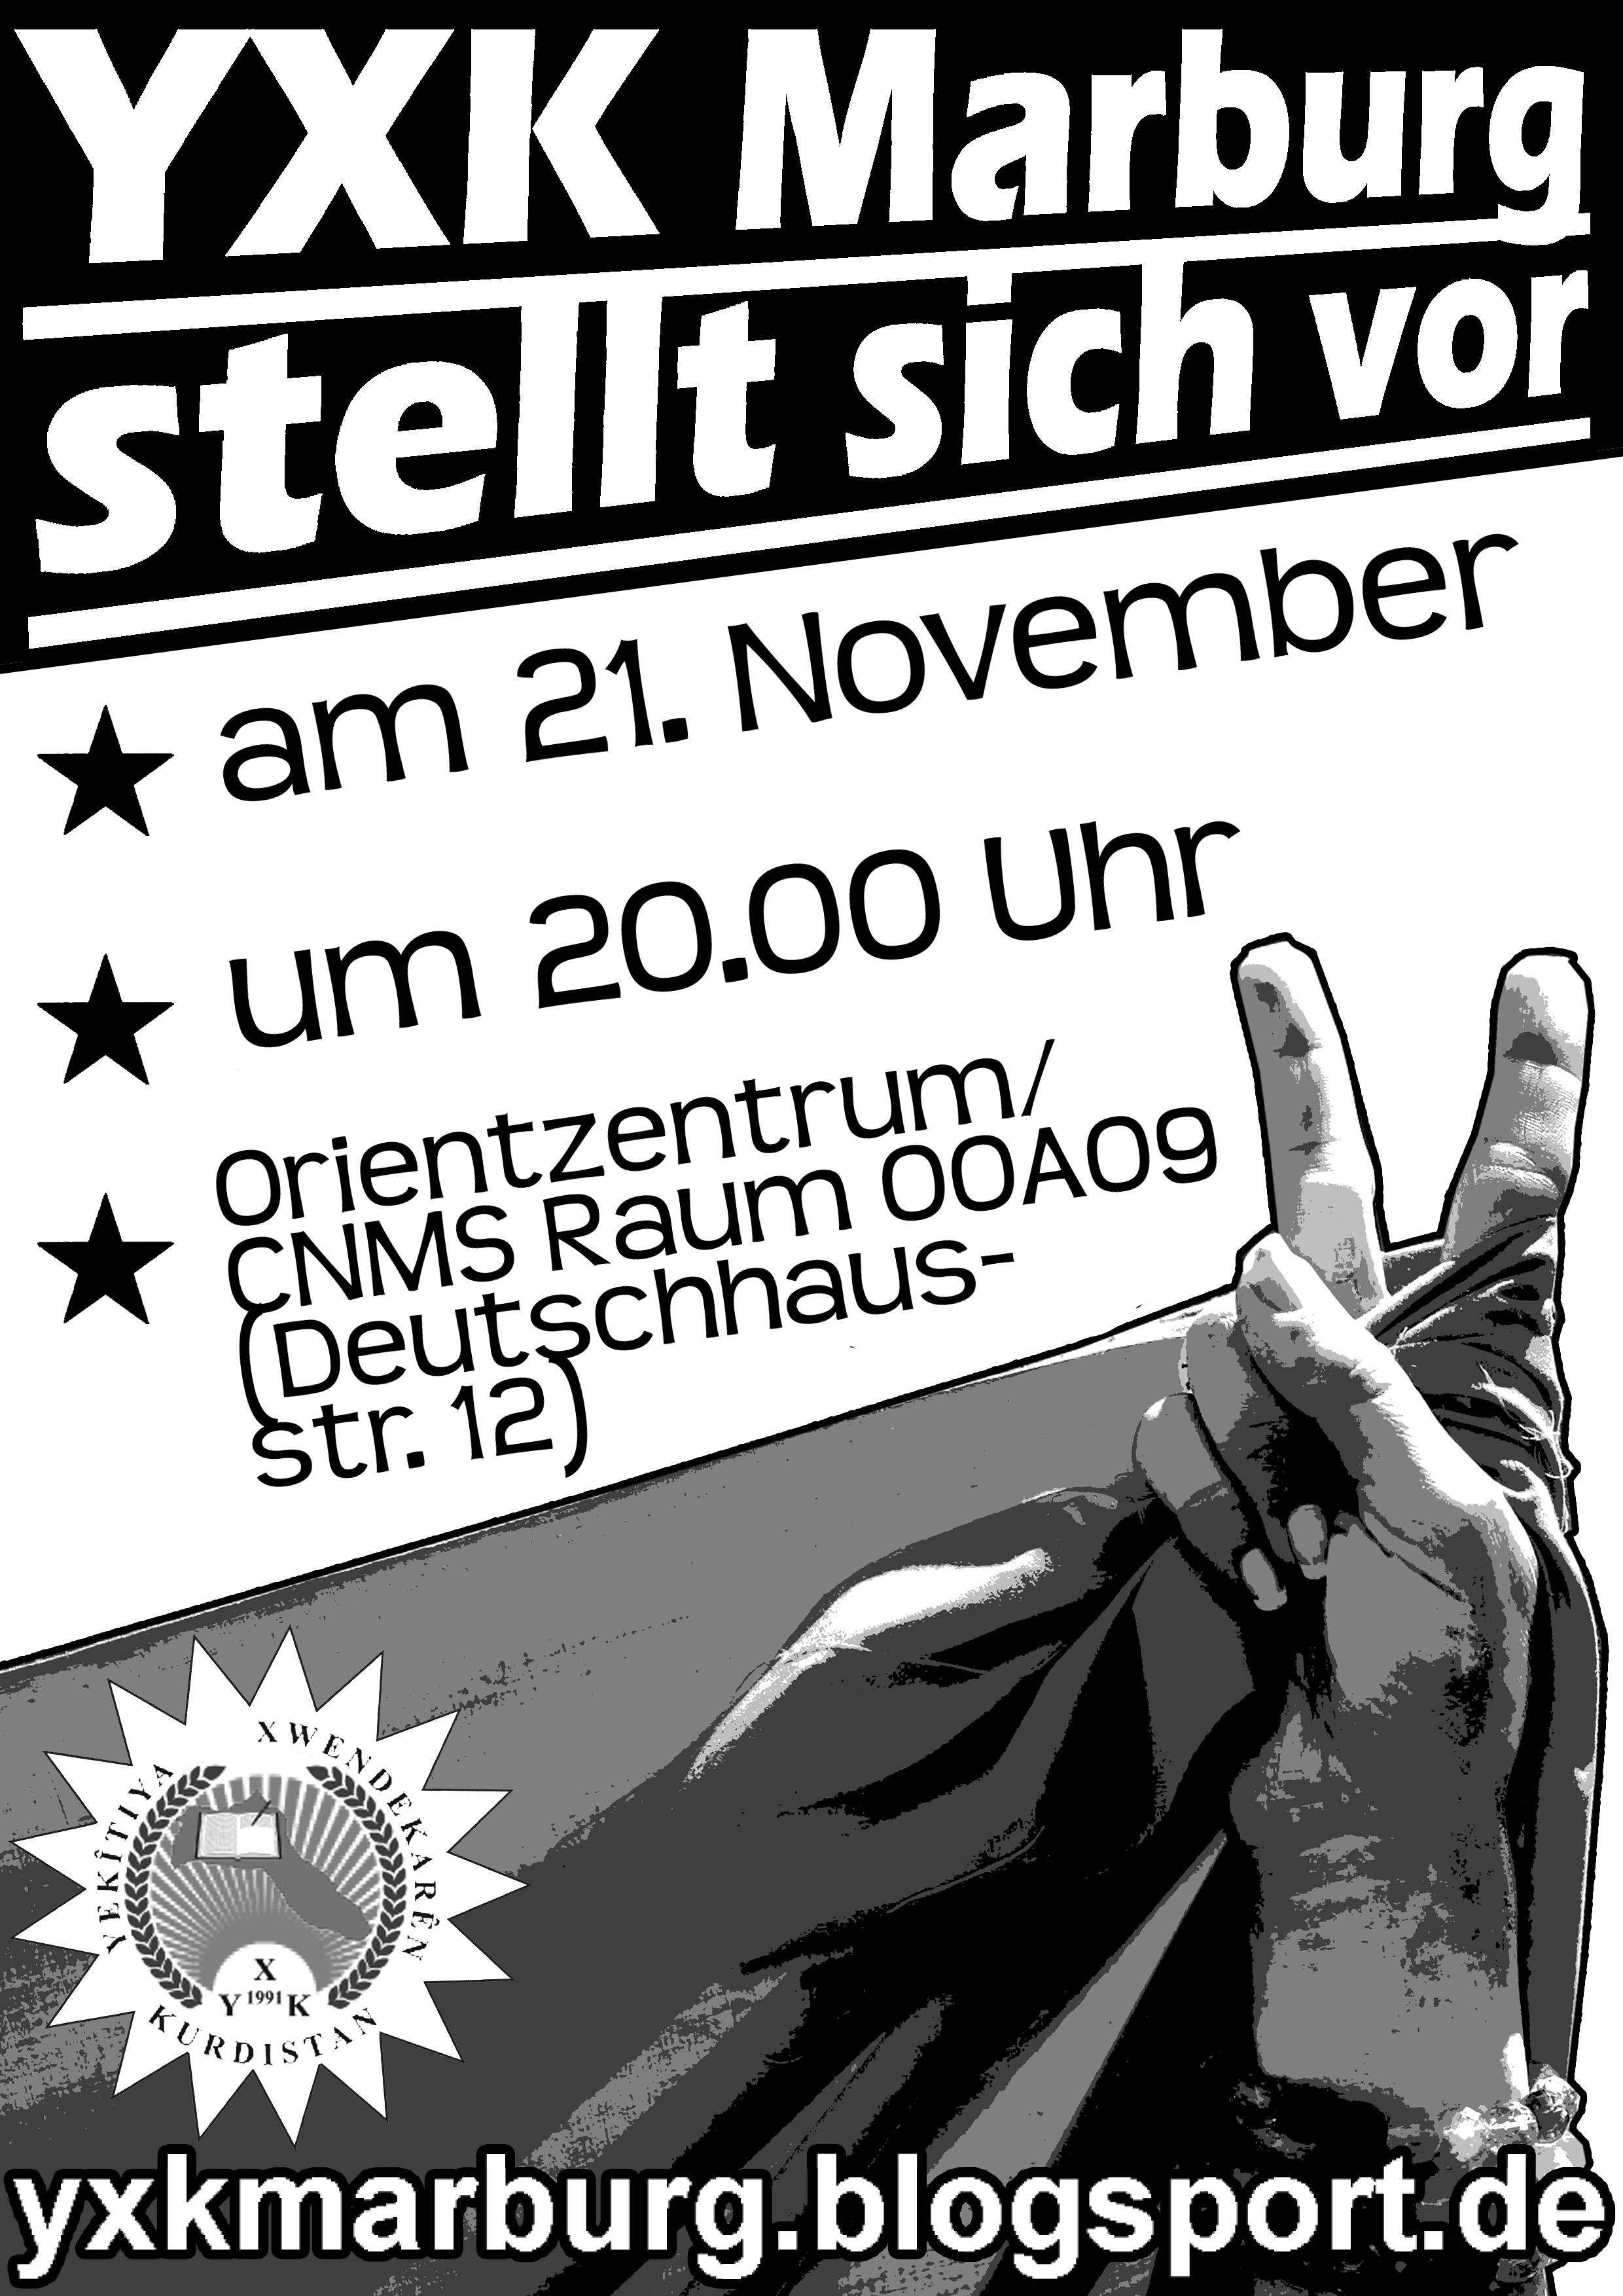 YXK-Marburg_Wintersemester2013/14